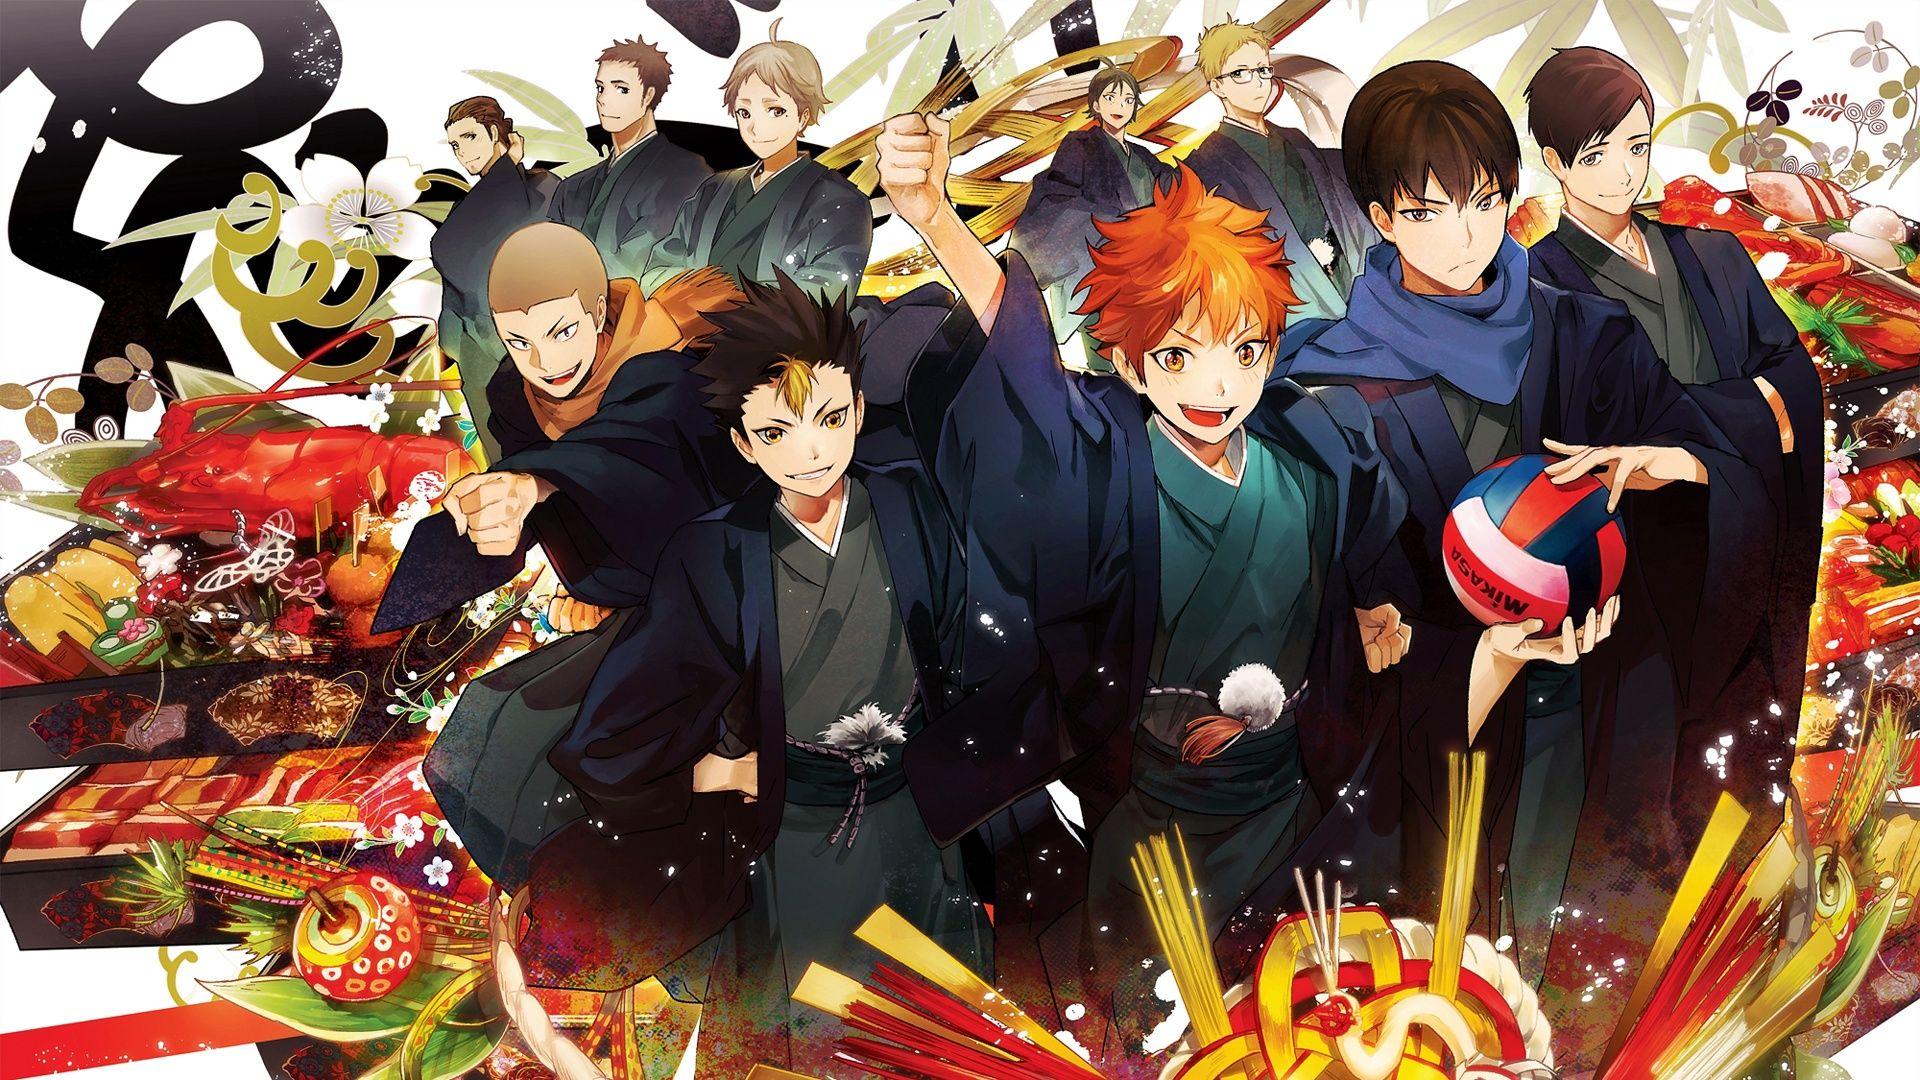 Anime Volleyball Haikyuu!! Poster